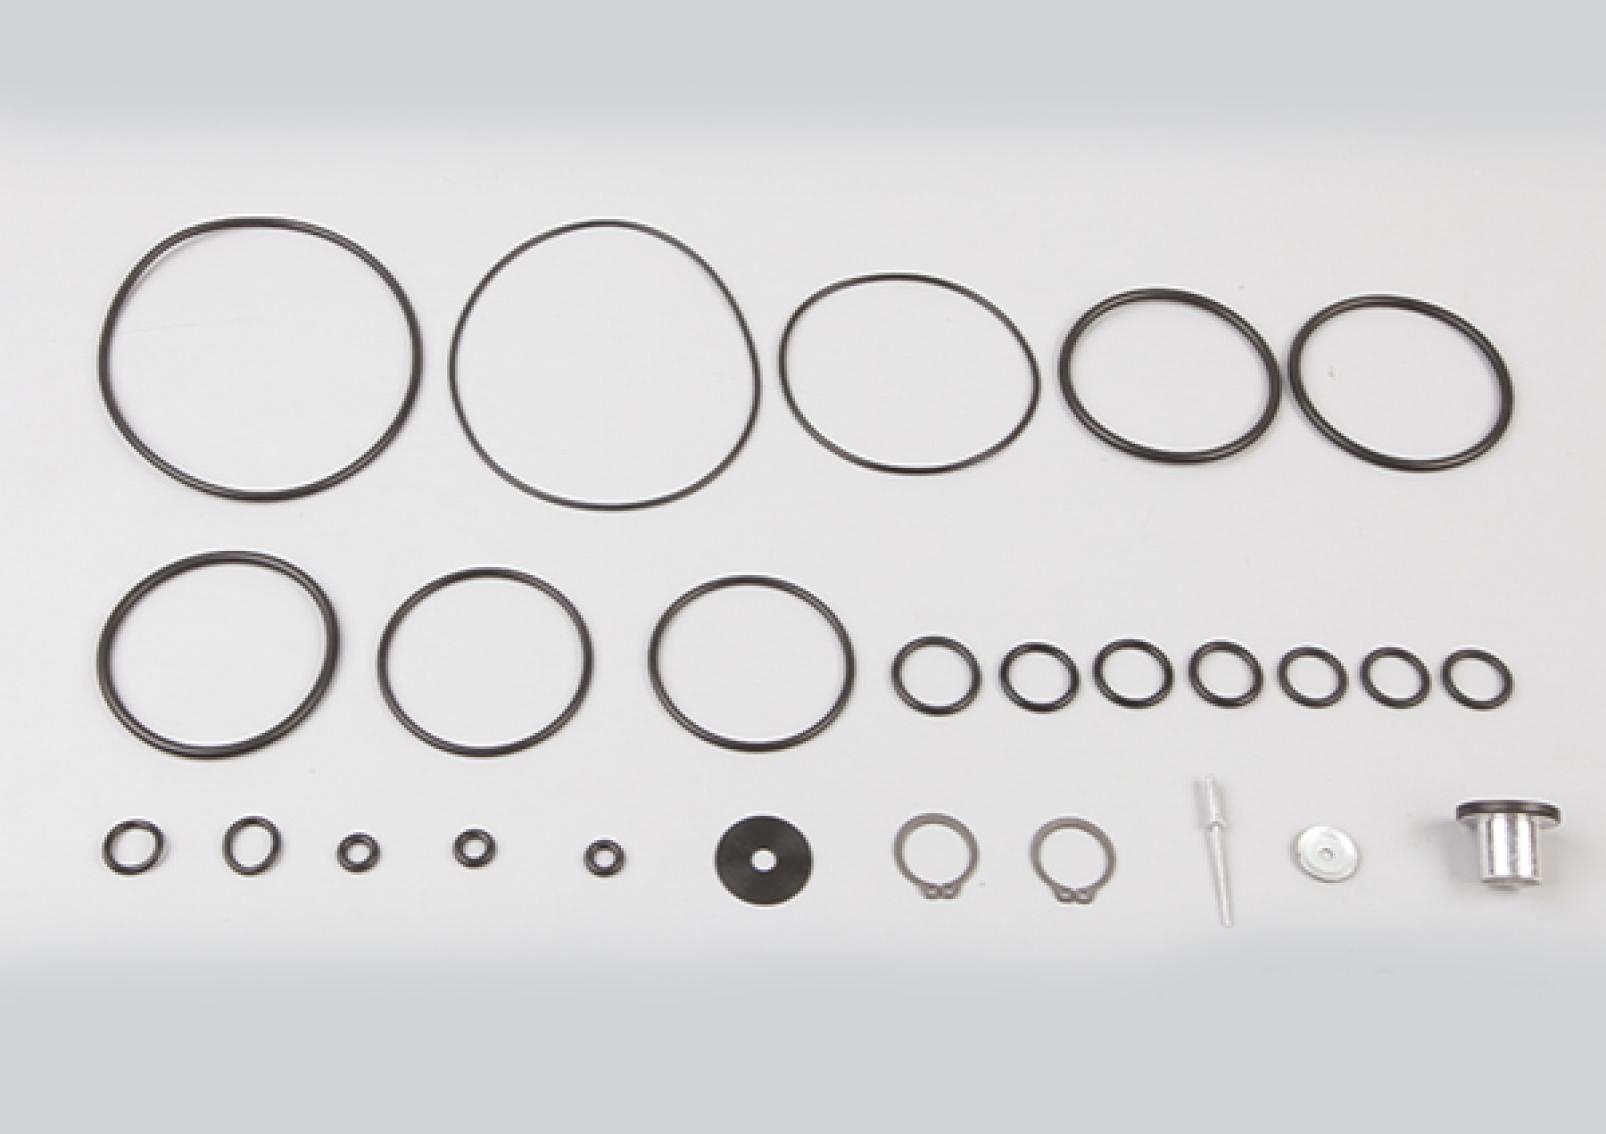 Trailer Control Valve Repair Kit, I81234